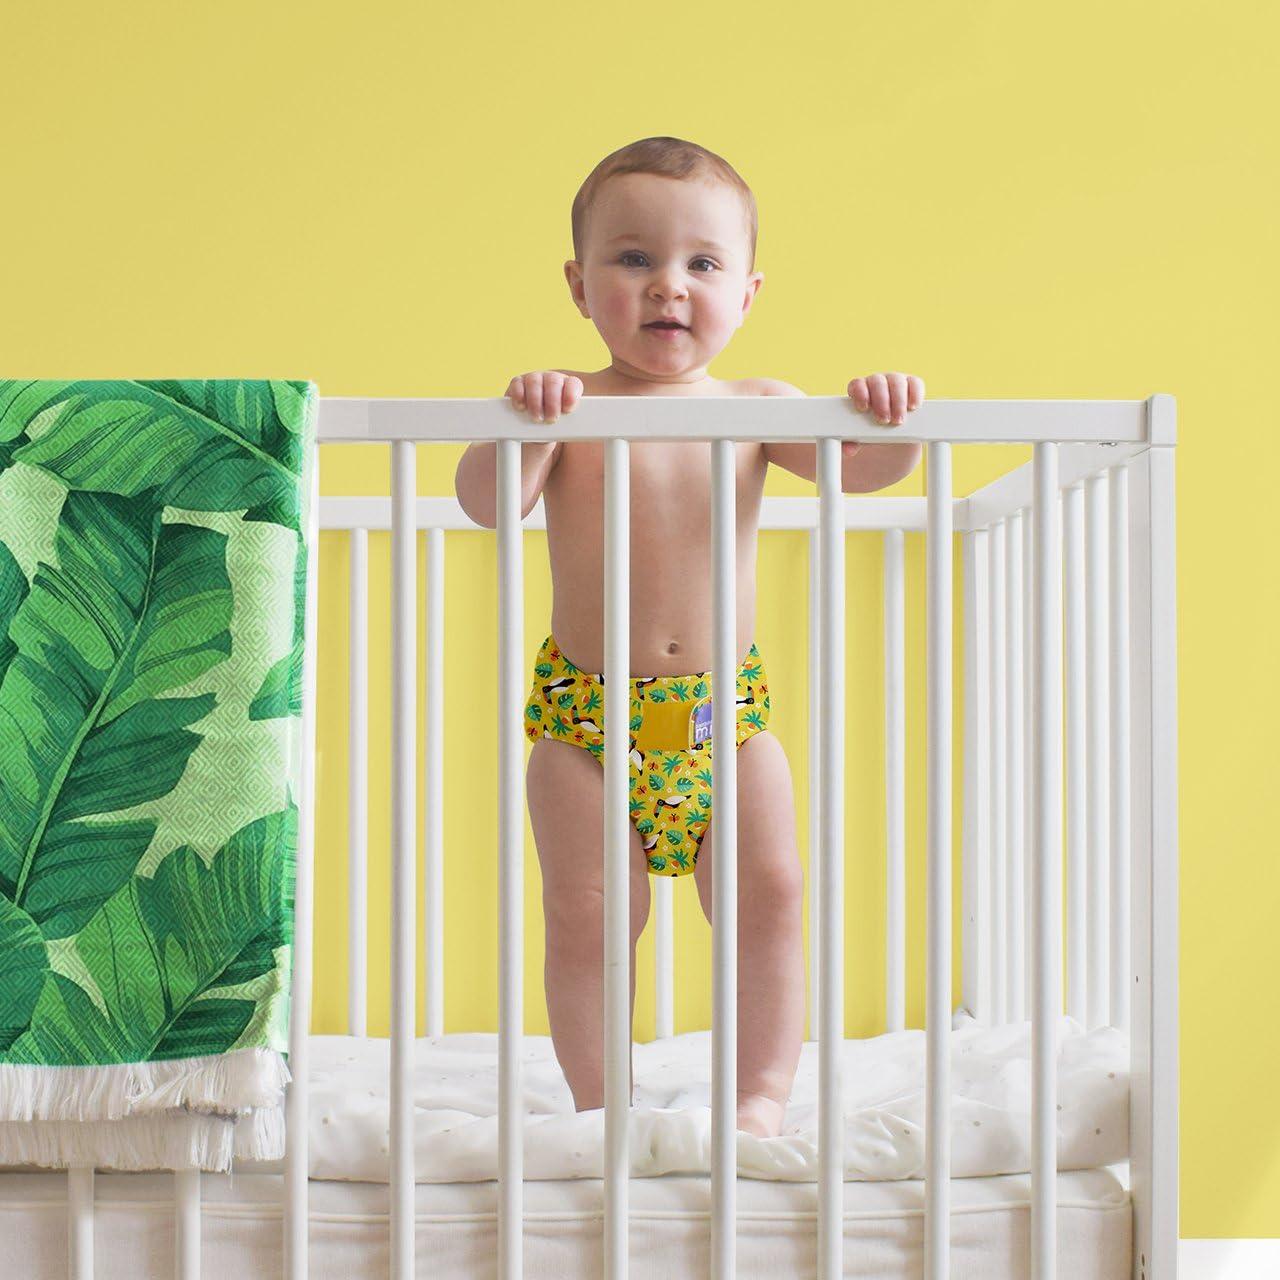 Size 2 Bambino Mio Miosoft Reusable Nappy Cover Savanna Stripes 9 kg